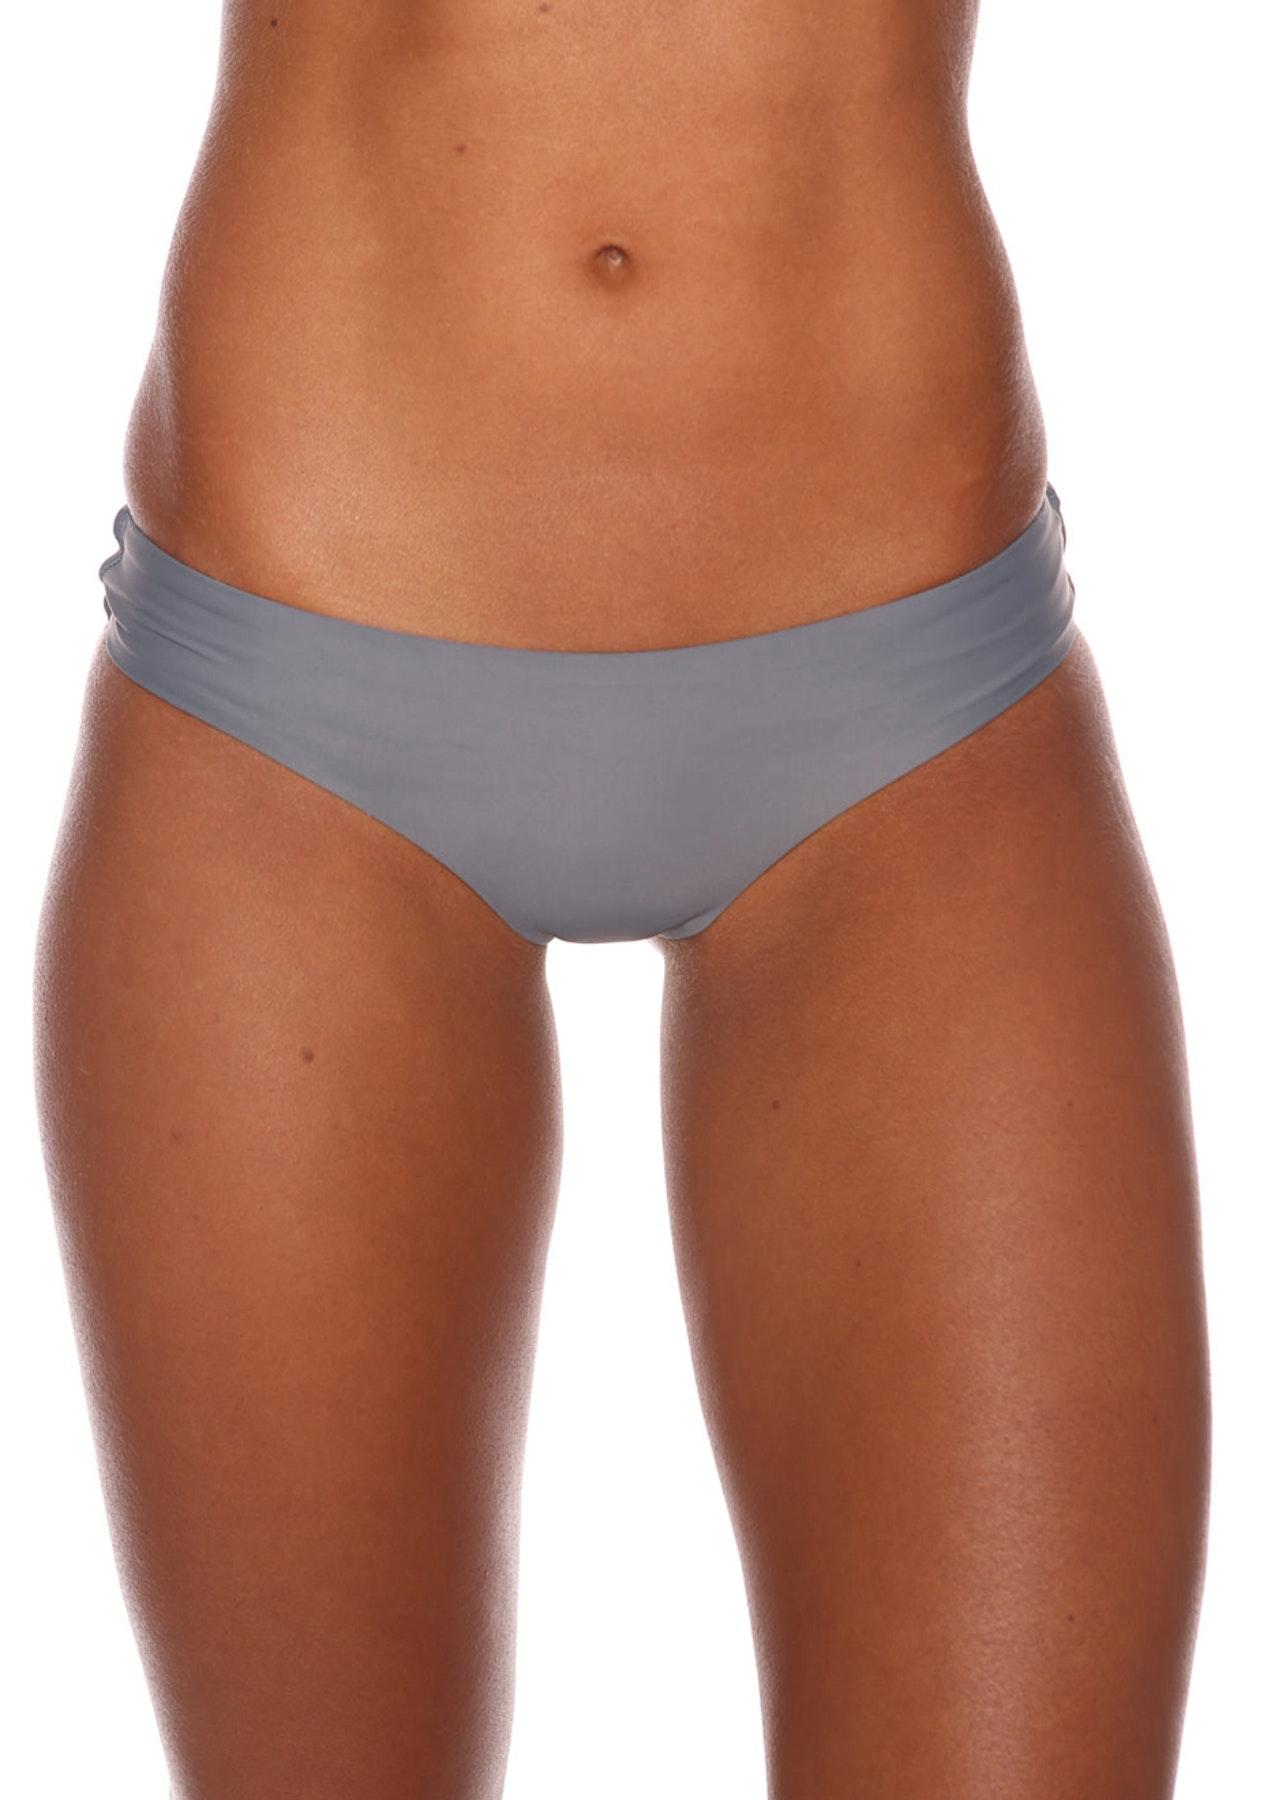 f1d7b74dc0bb8 Sheridyn Swim - Escape Bikini Bottom Smoke - Sheridyn Swimwear From  9.95 -  Onceit